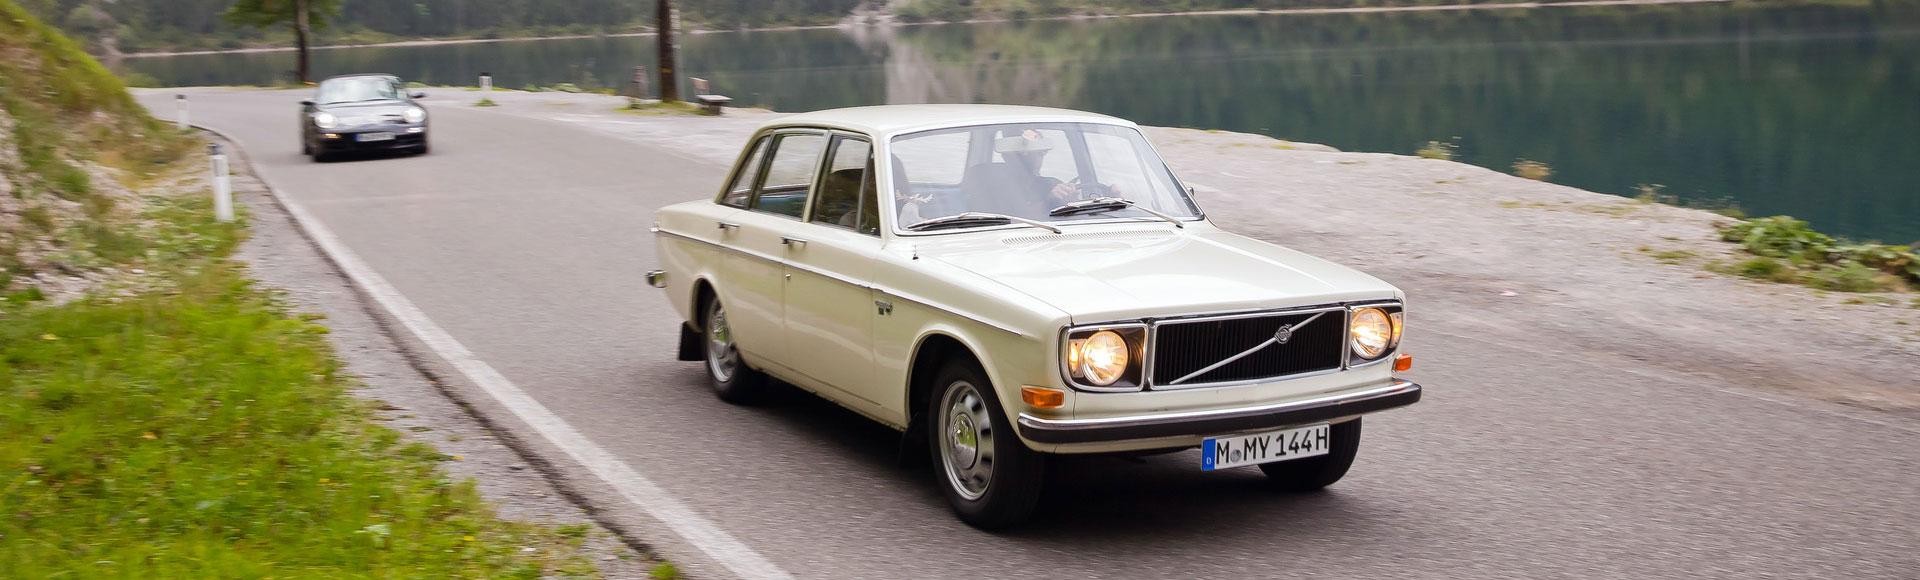 Volvo 144 1971 0021 Herbst